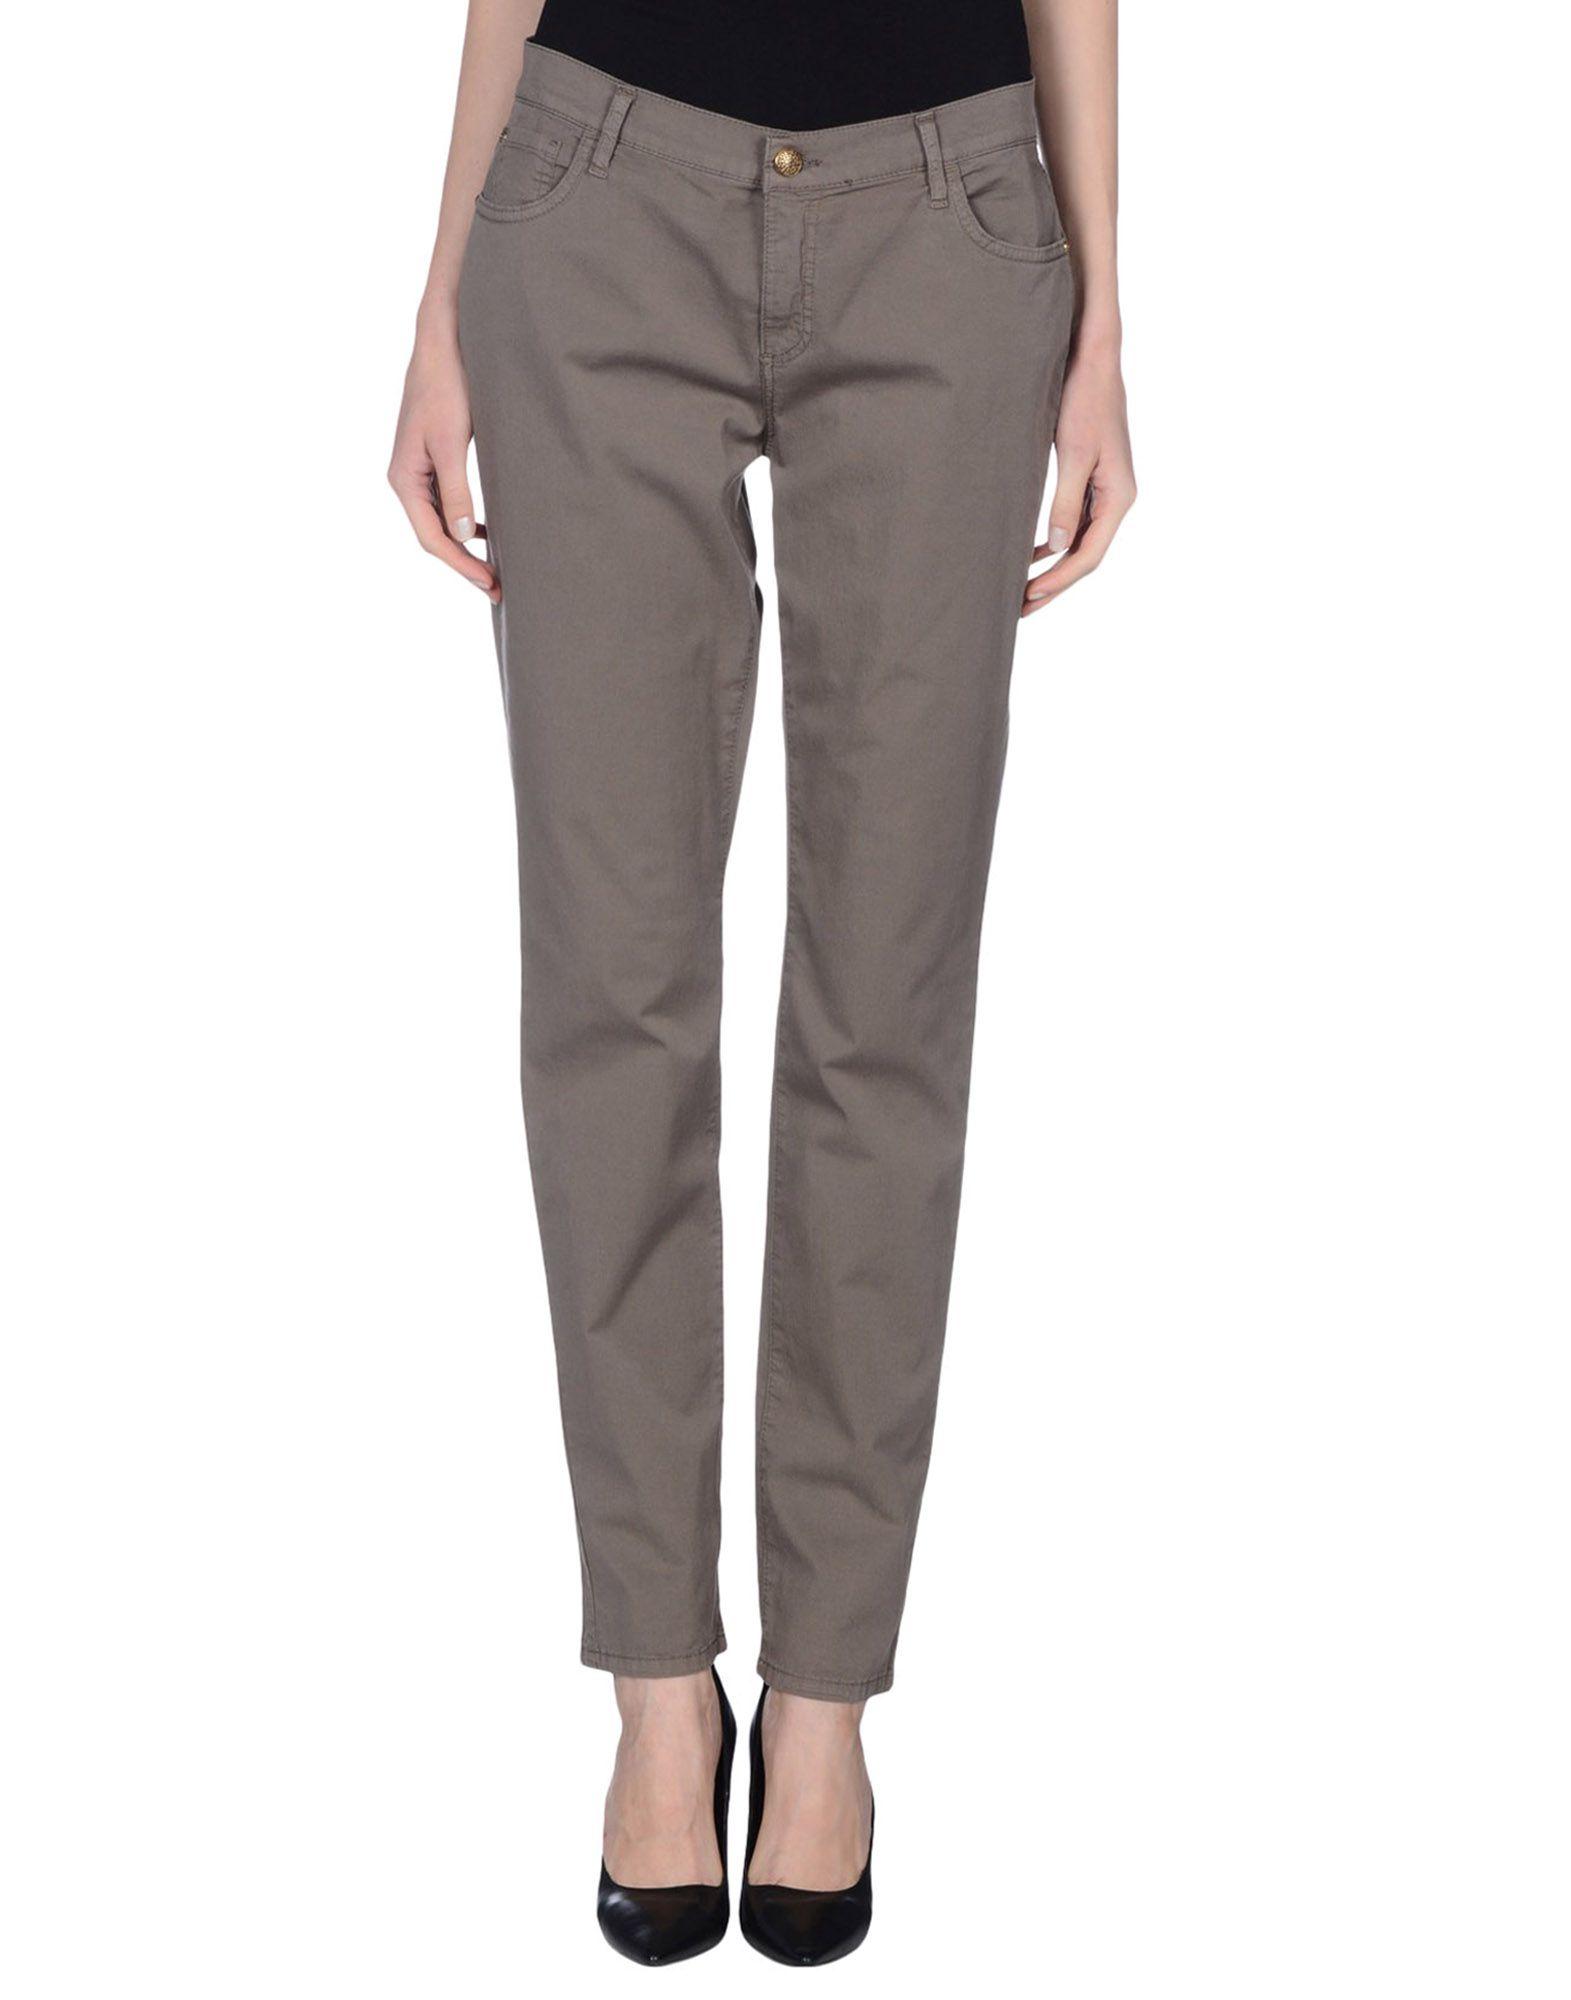 'Holiday Jeans Company Casual Pants